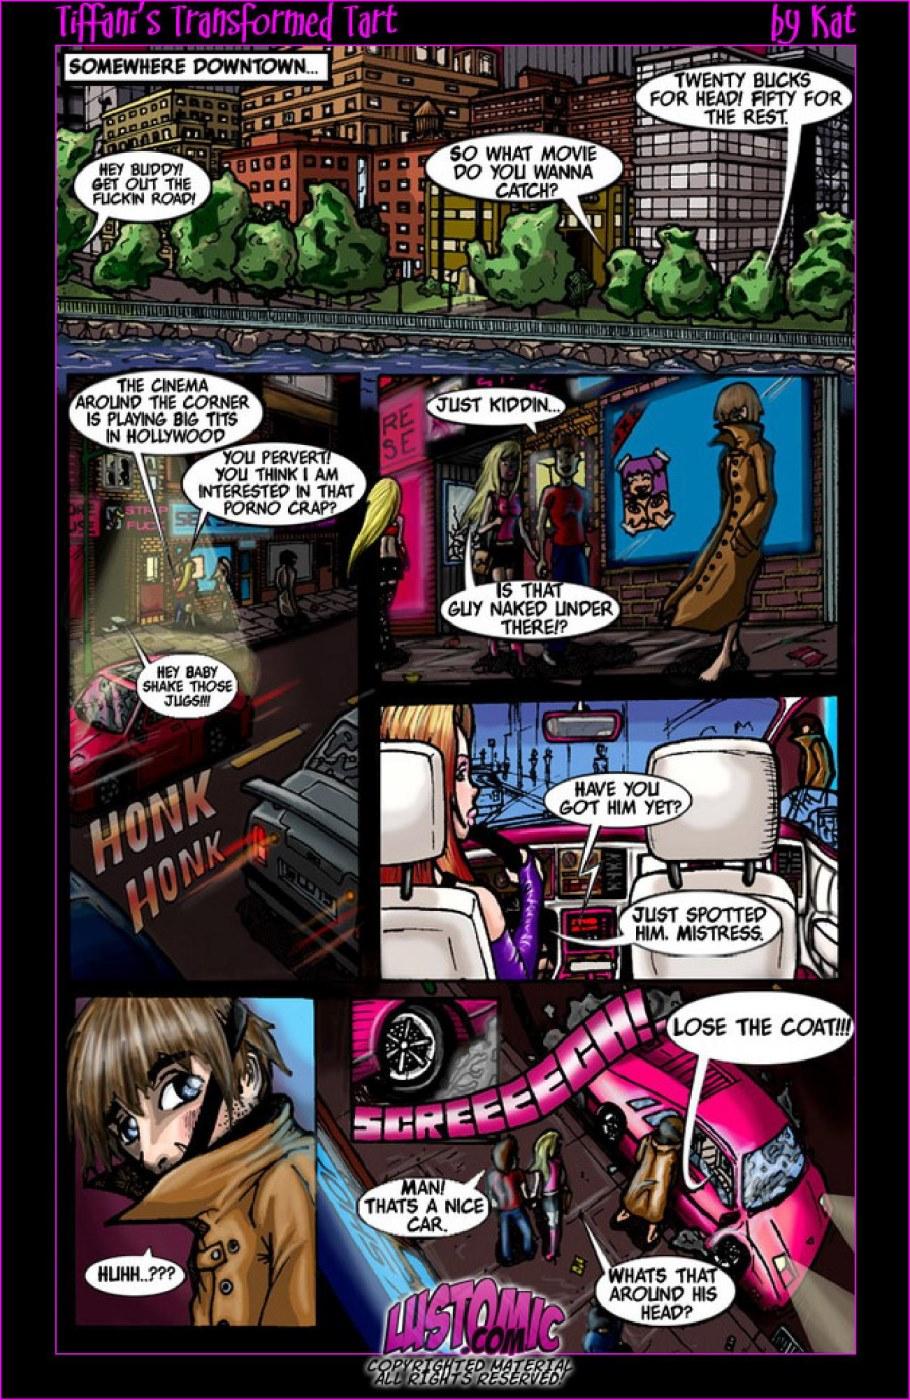 Porn Comics - Tiffani's Transformed Tart- Lustomic porn comics 8 muses